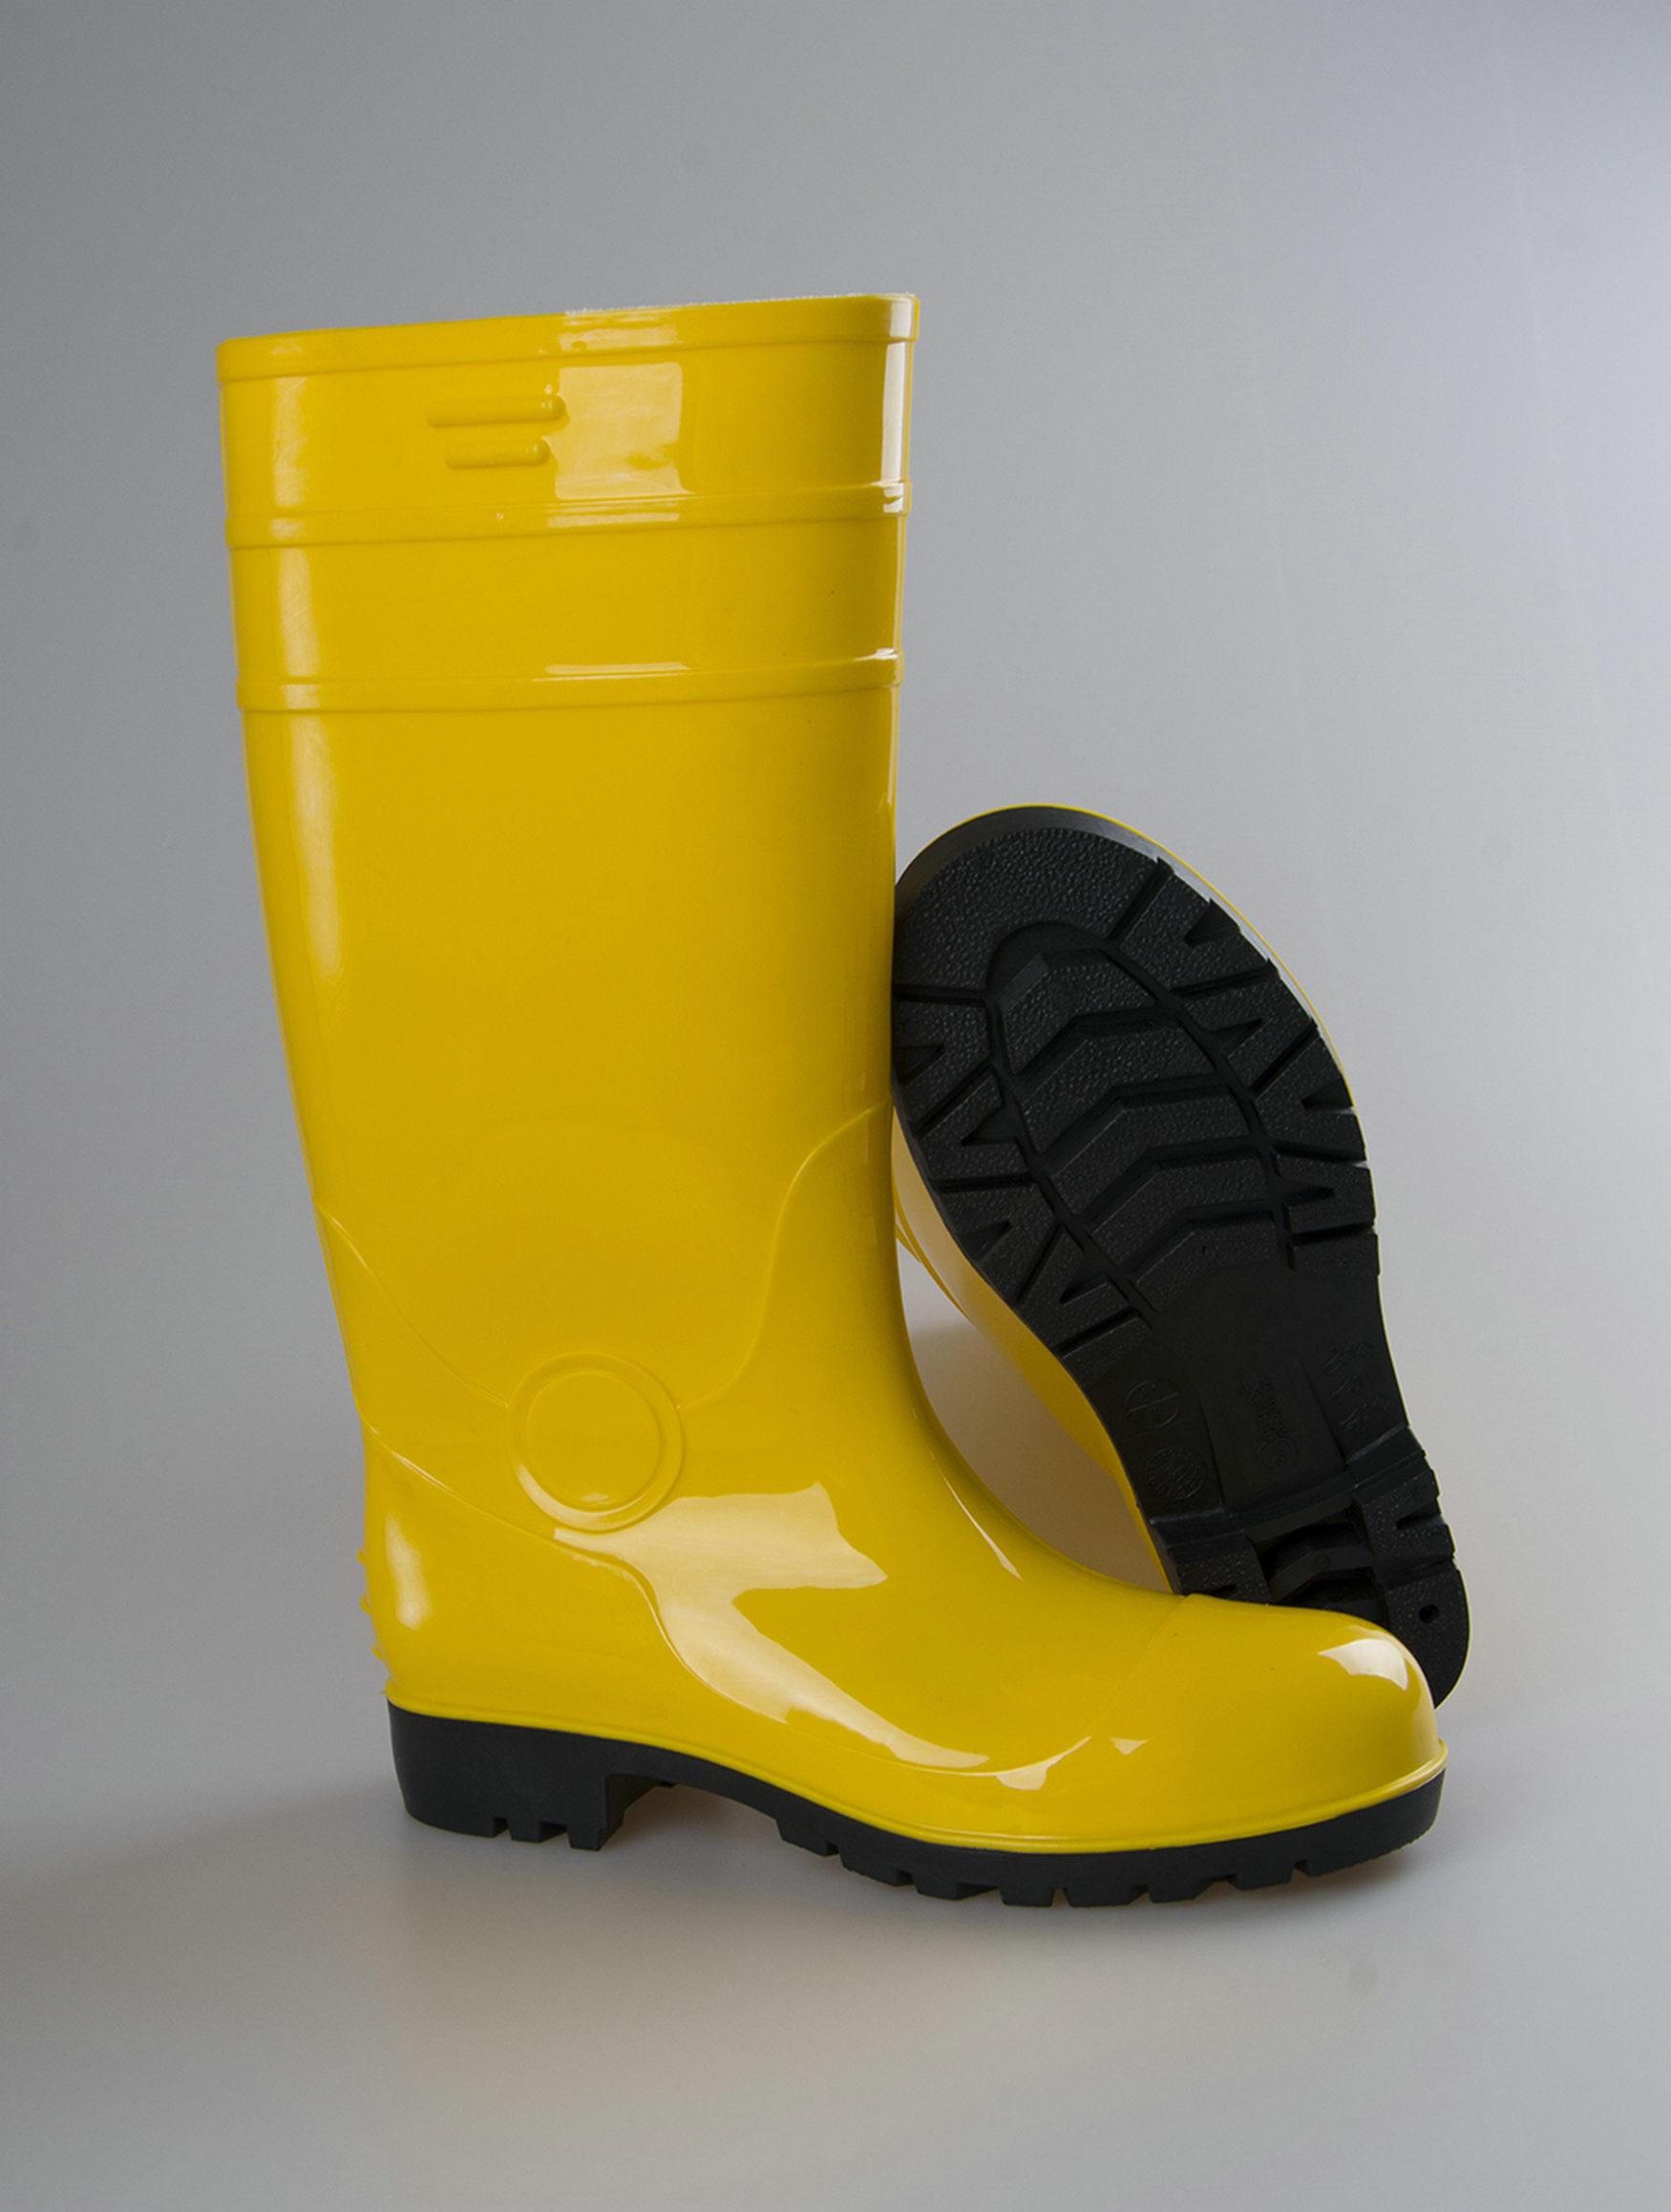 8a7a36cea414 China Wellington Safety PVC Rainboots